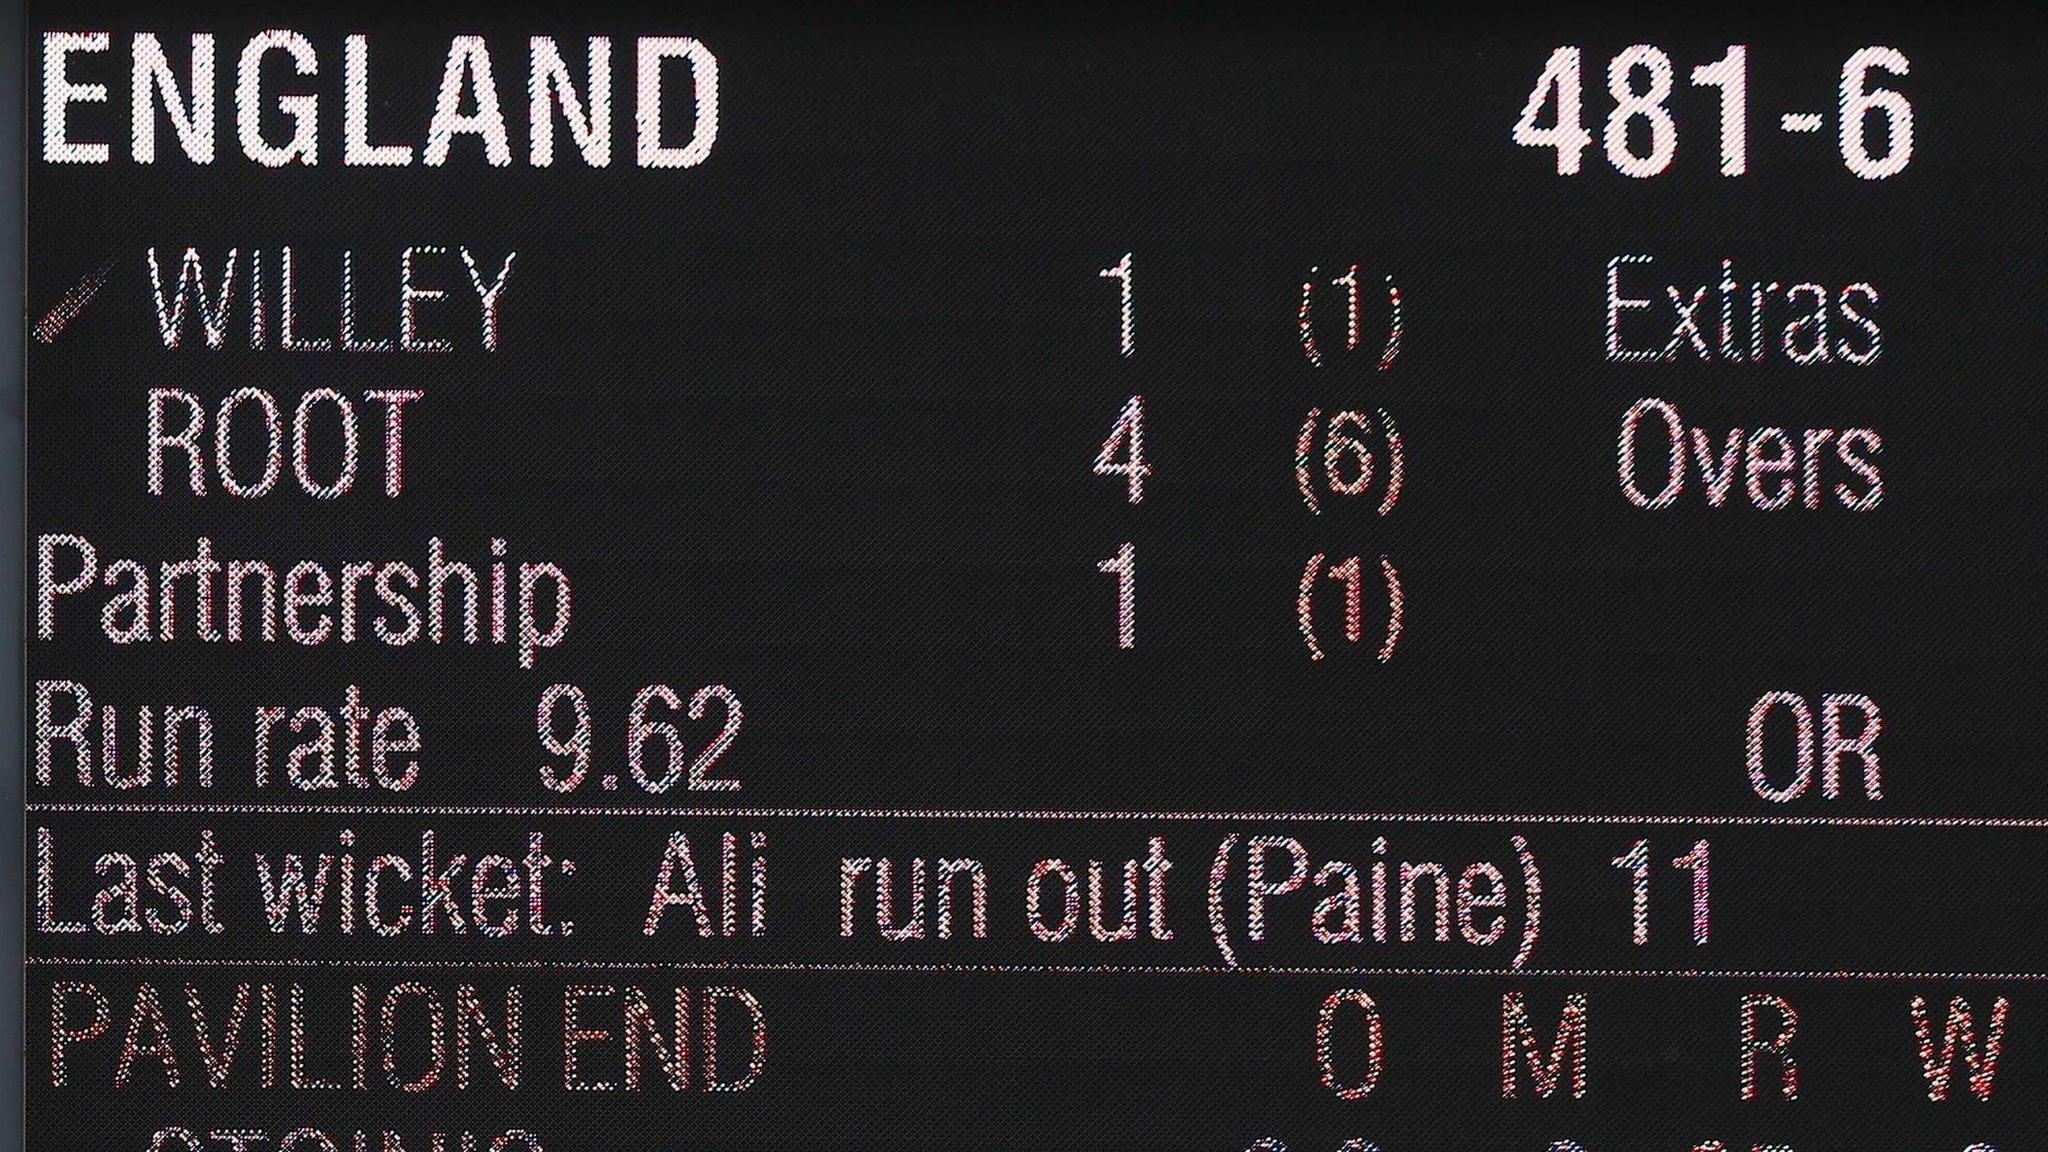 England post ODI record 481-6 against Australia